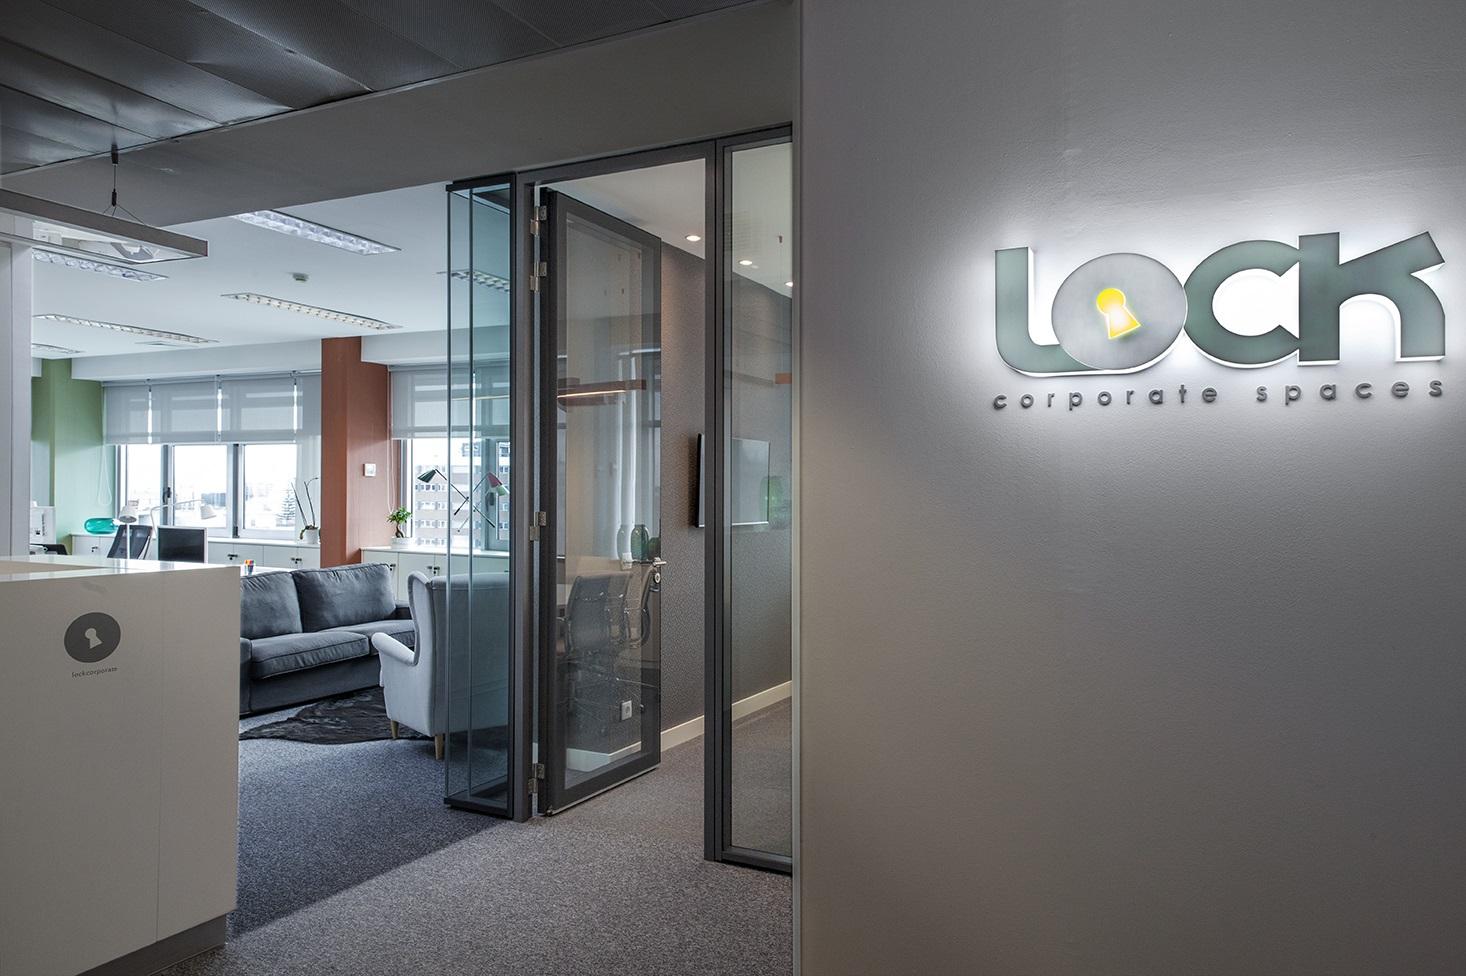 Escritórios Lock / Lock Corporate Spaces